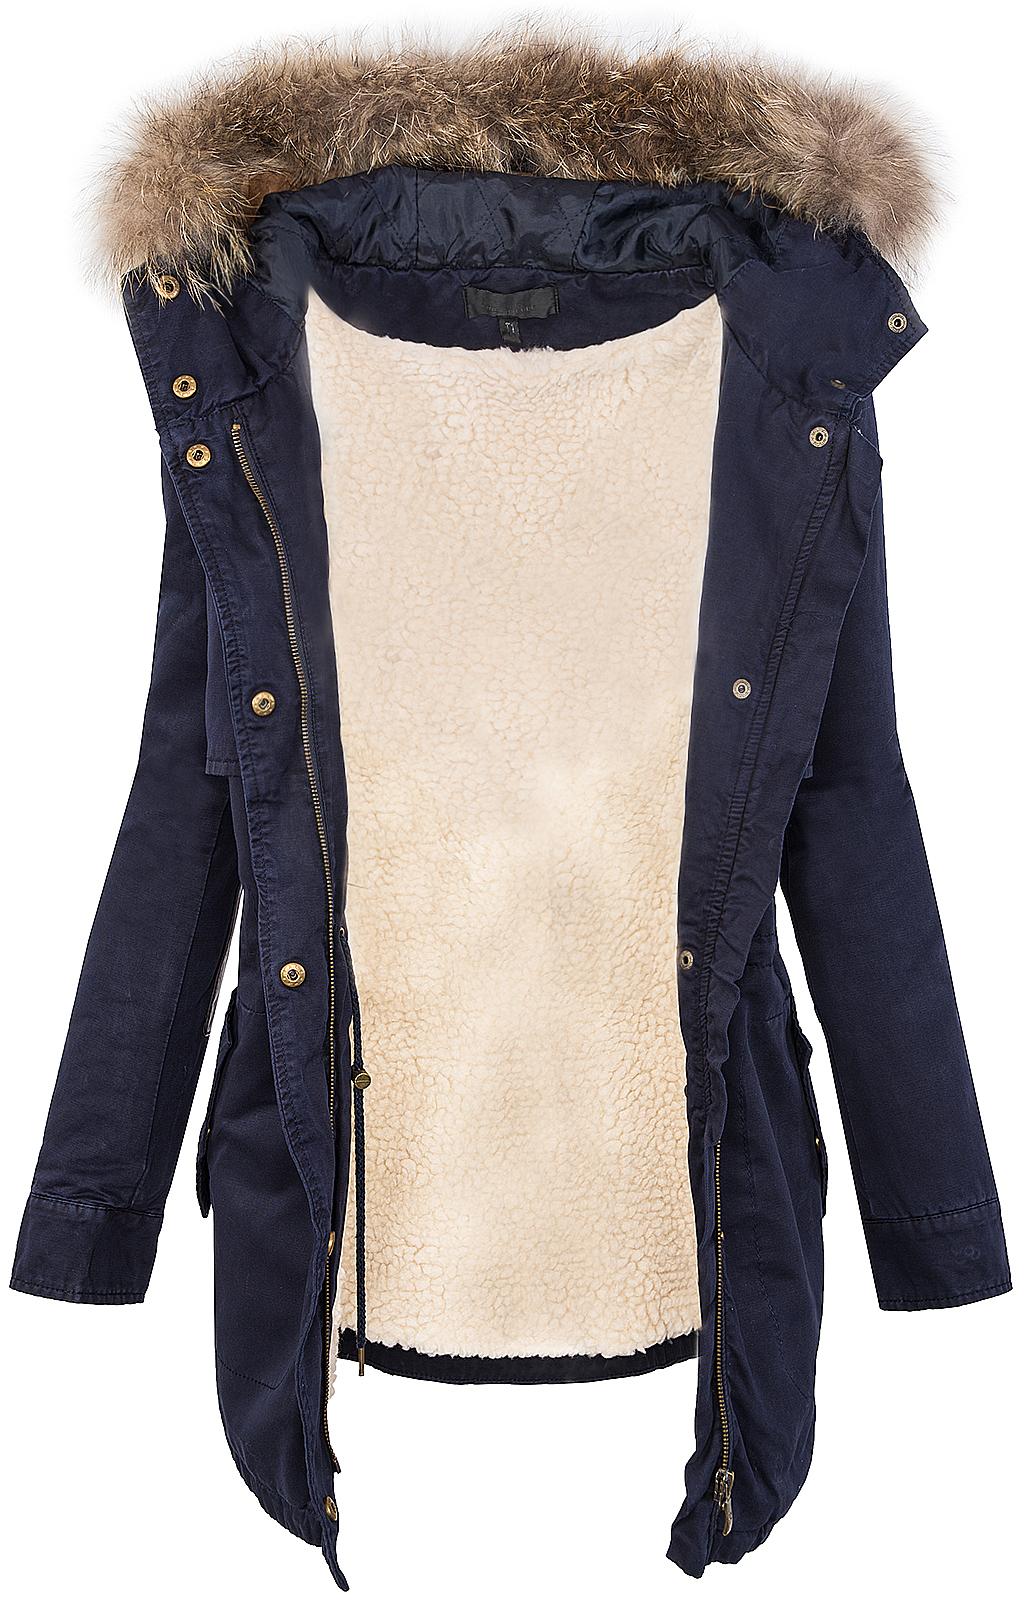 designer damen parka jacke kapuze mit echt pelz teddyfell mantel winter d20 ebay. Black Bedroom Furniture Sets. Home Design Ideas